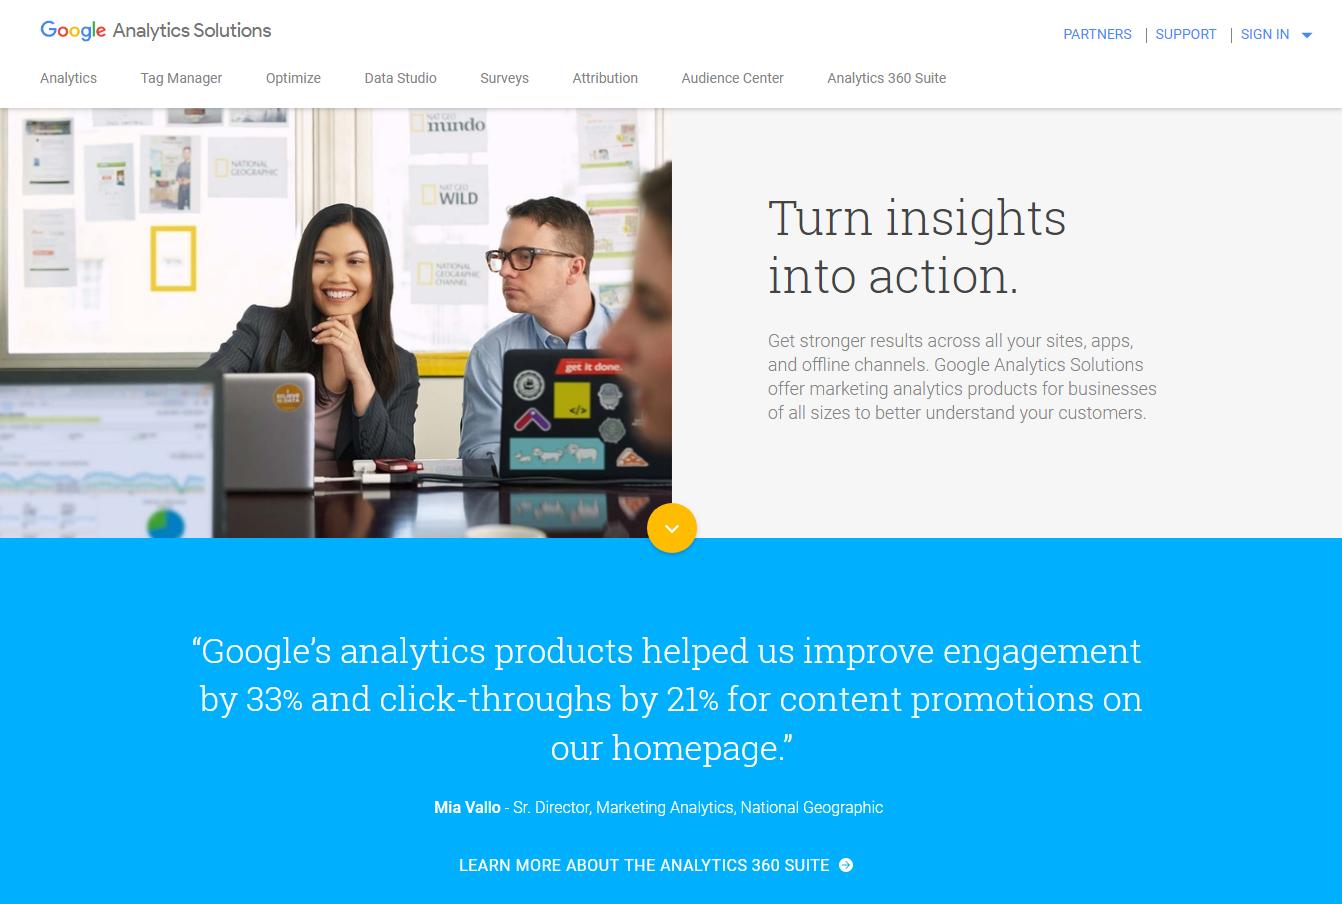 Google Analytics - ابزارهای تجزیه و تحلیل وب سایت